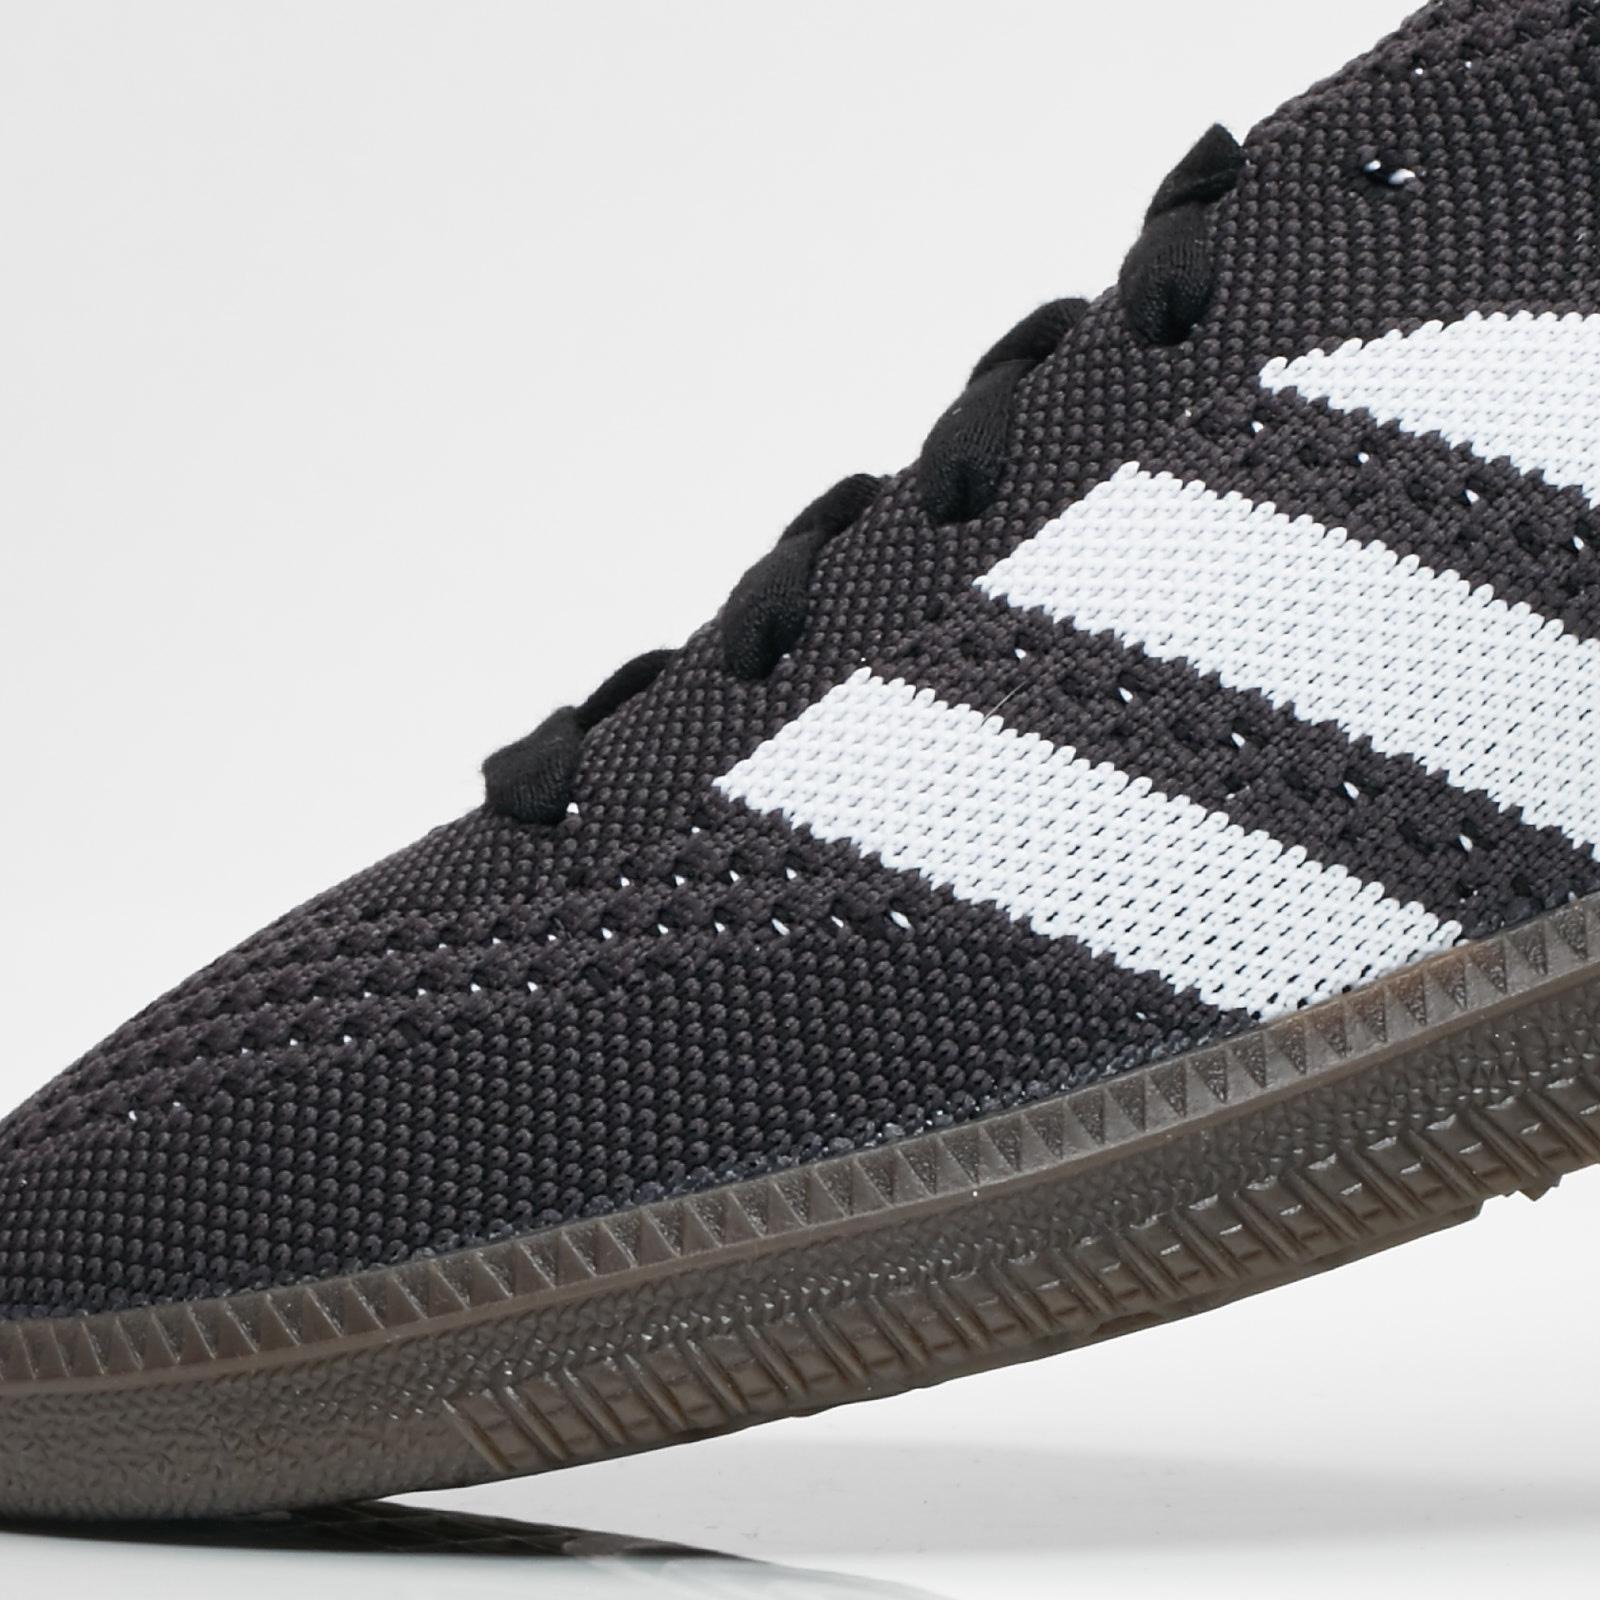 new concept 5daed 17499 adidas Originals Samba PK Sock - 6. Close